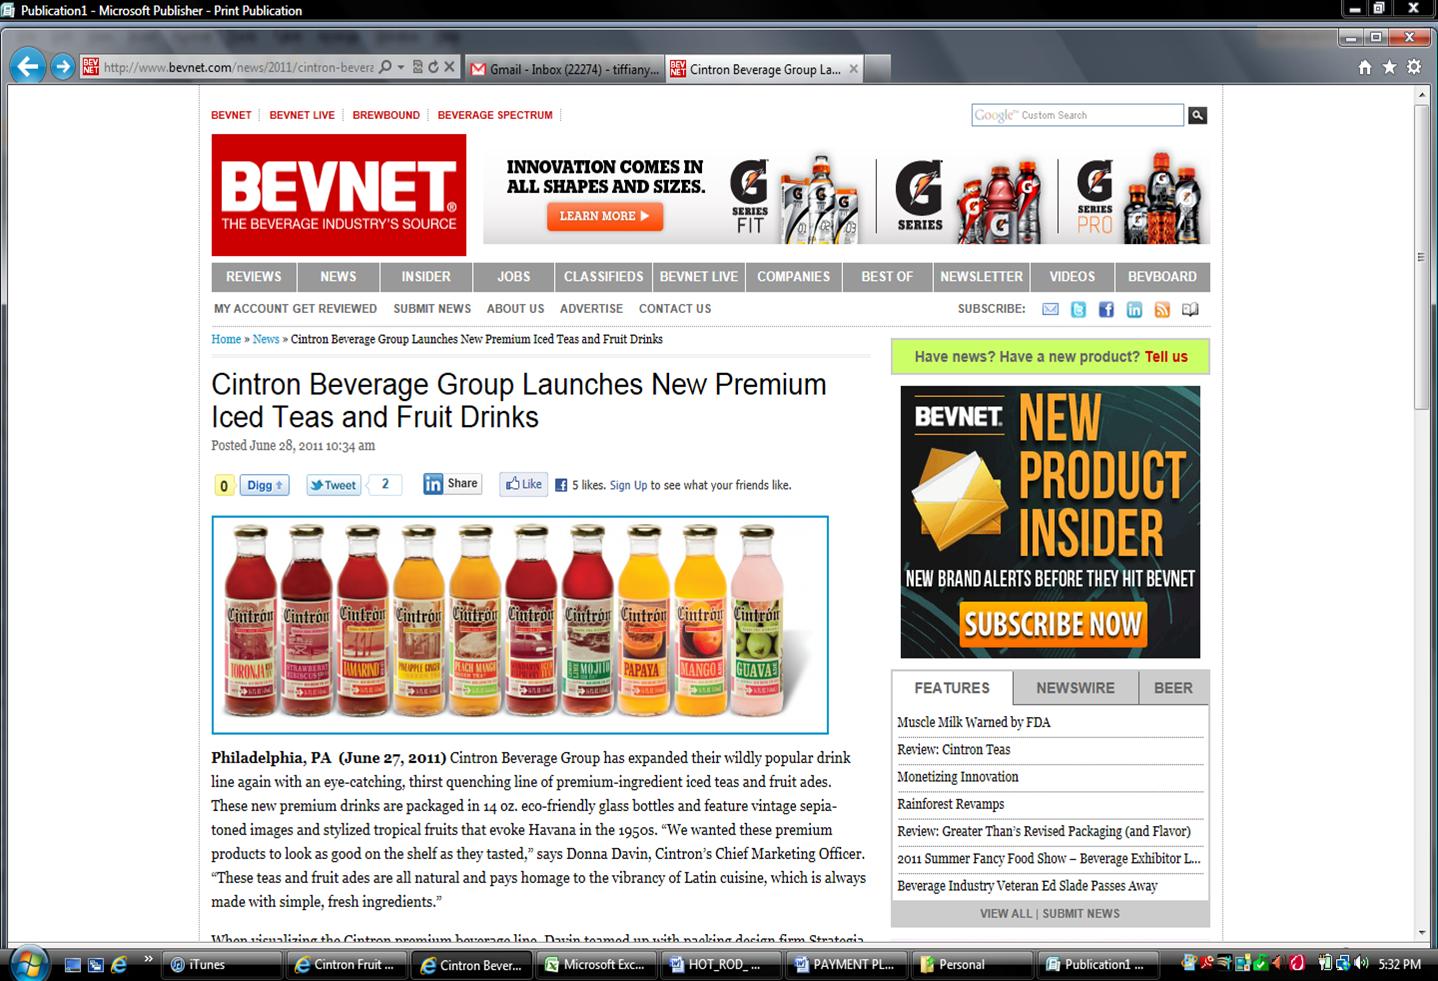 BevNet | Cintron Beverage Group